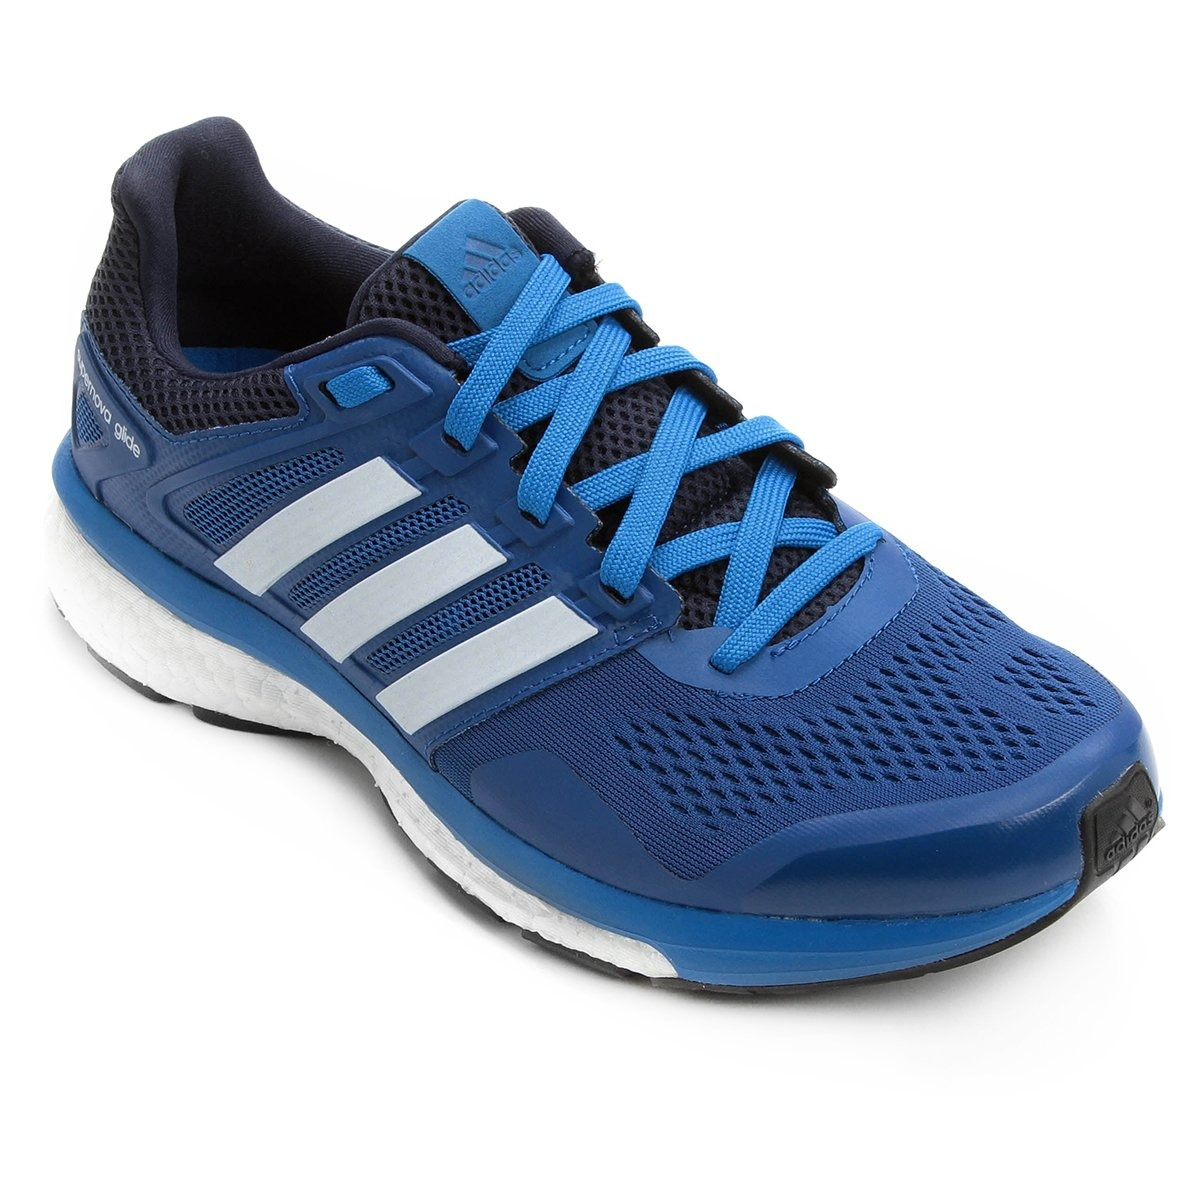 tenis adidas sn glide boost 8 masculino af6546 - 39 - padrão. Carregando  zoom. f33038f5a6377